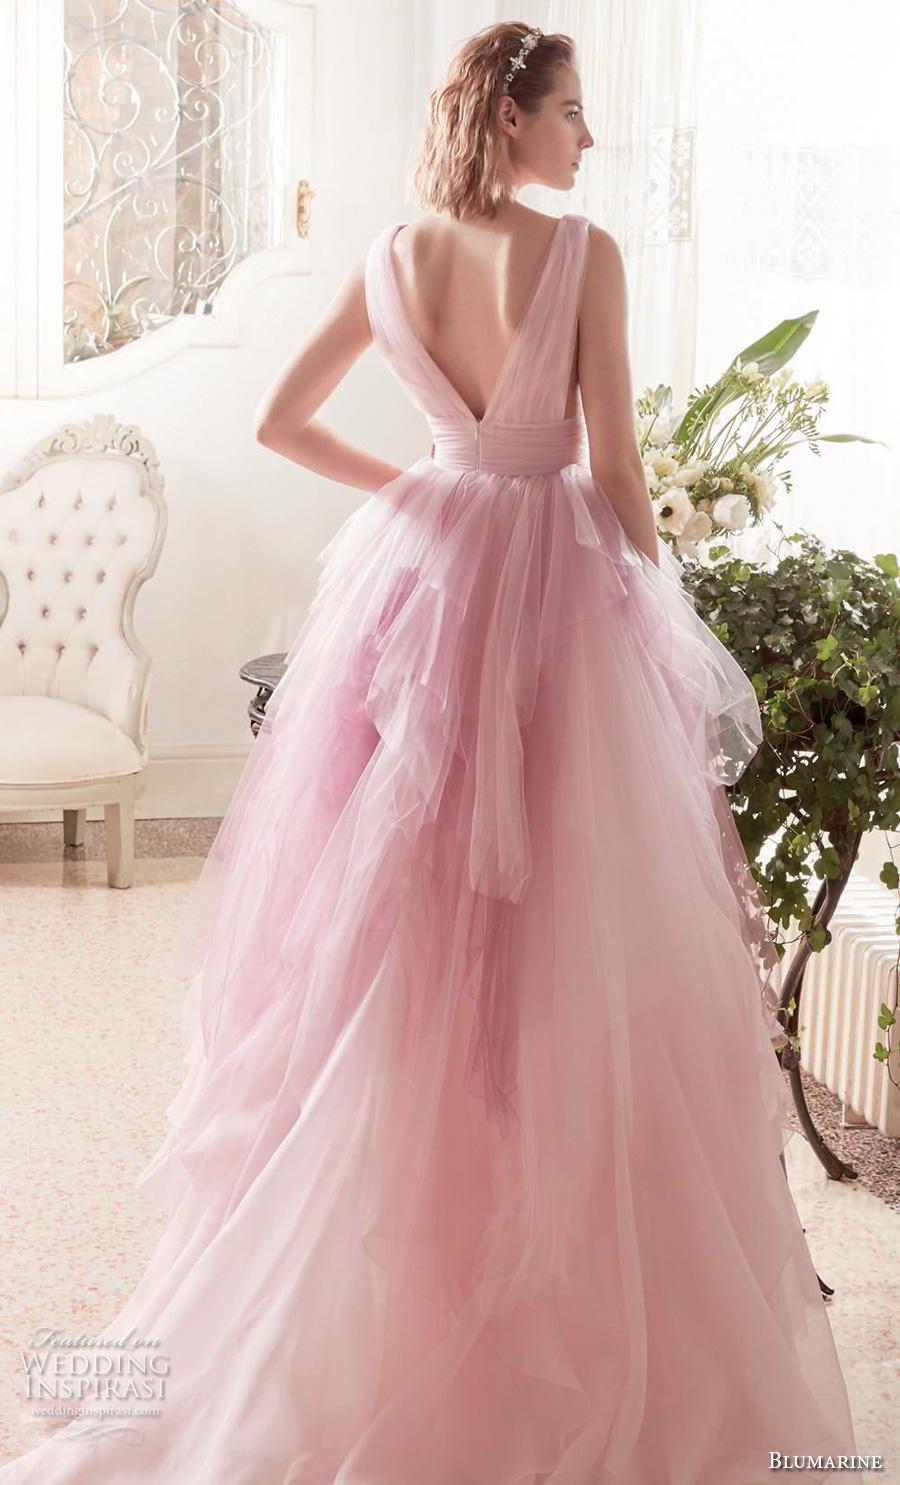 blumarine sposa 2019 bridal sleeveless deep v neck ruched bodice tiered tulle skirt romantic pink blush wedding dress v back chapel train (12) bv